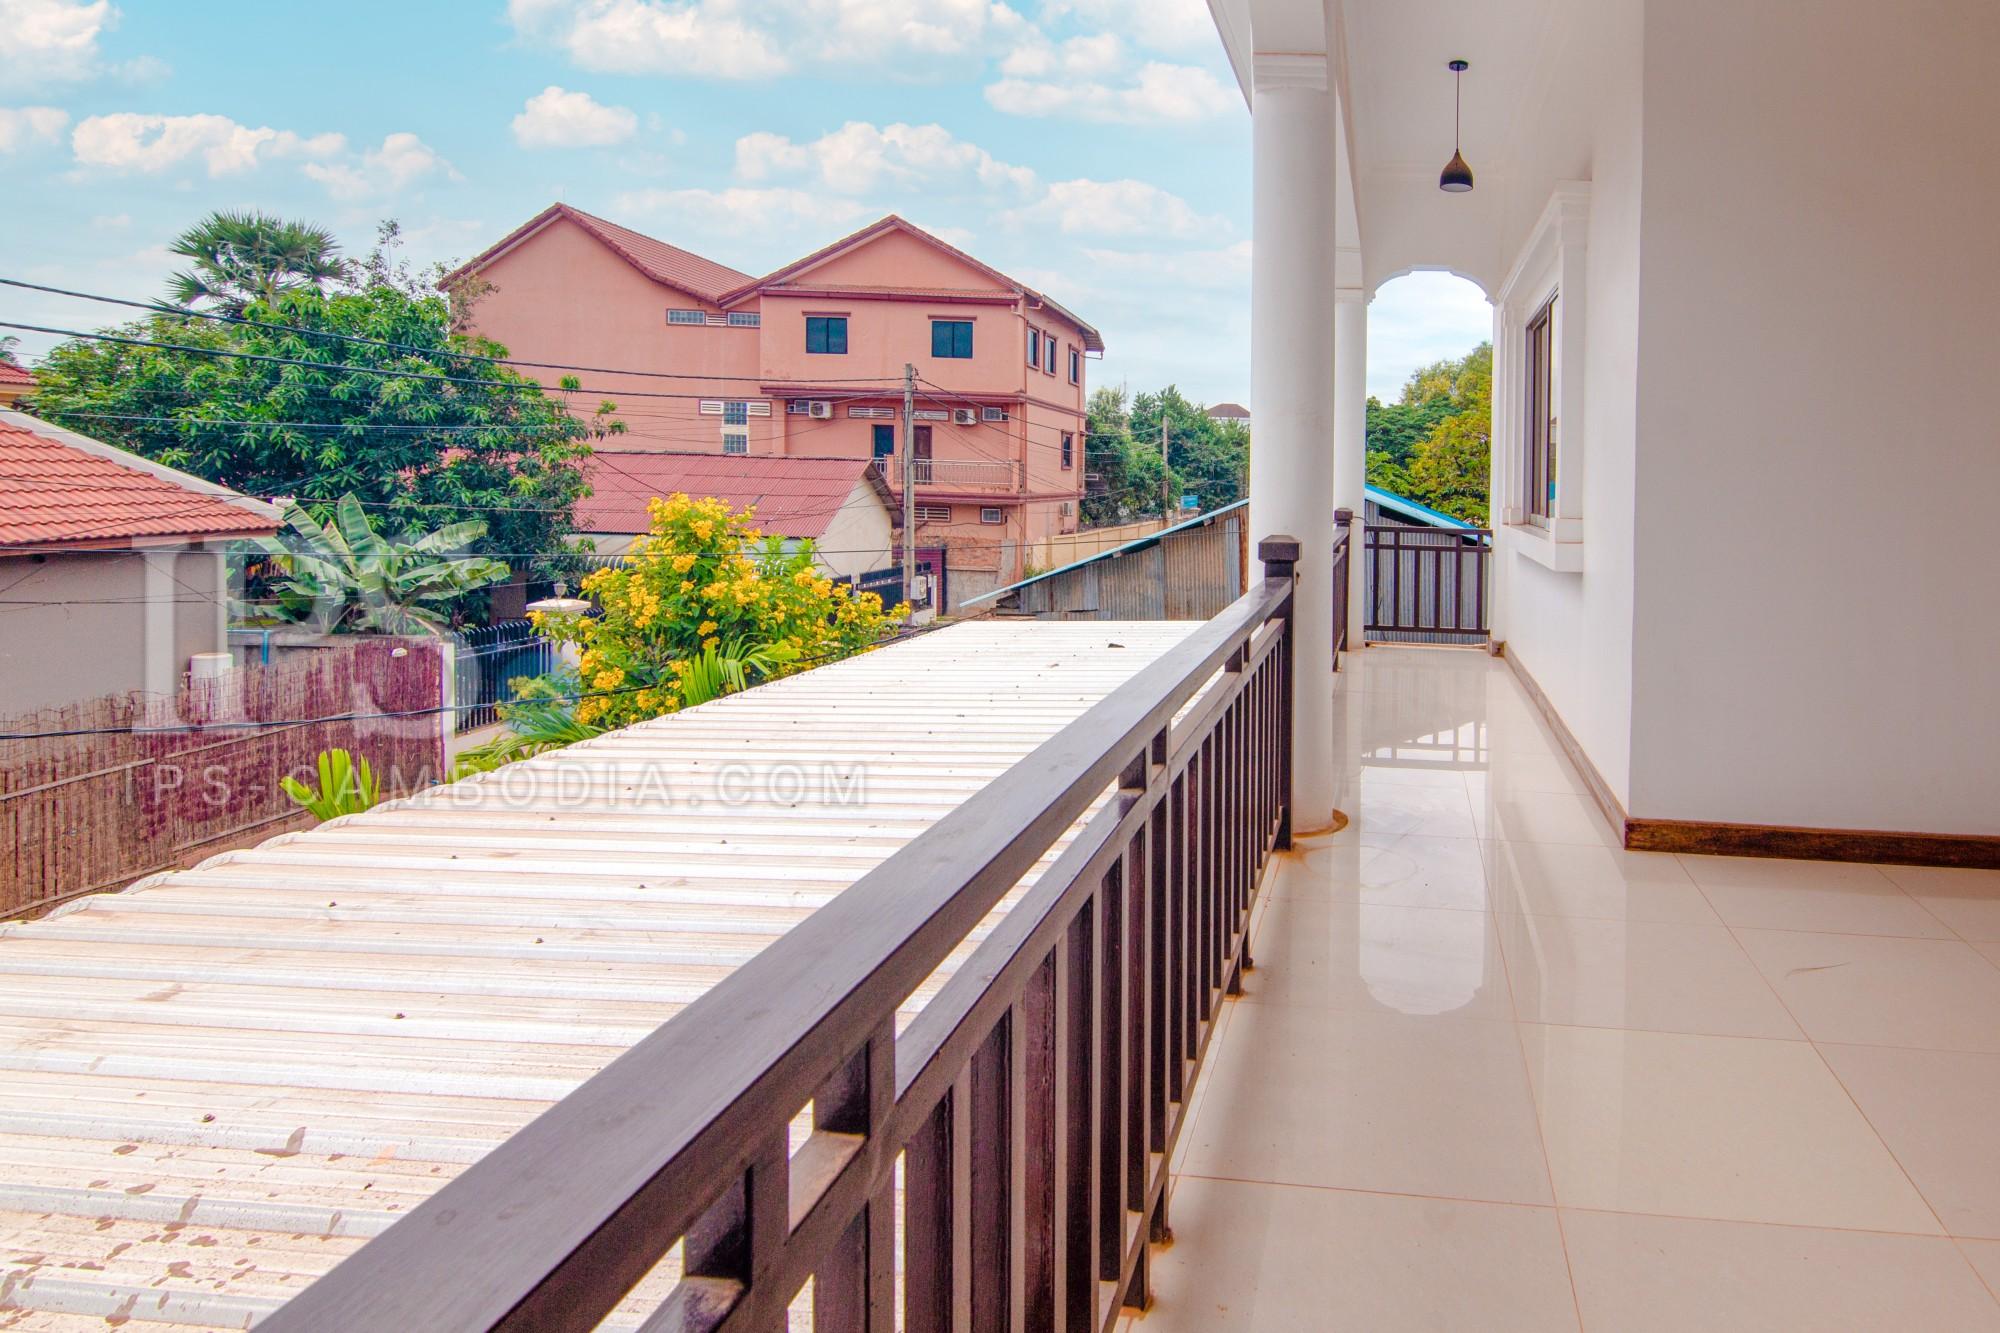 4 Bedroom House  For Rent - Svay Dangkum, Siem Reap